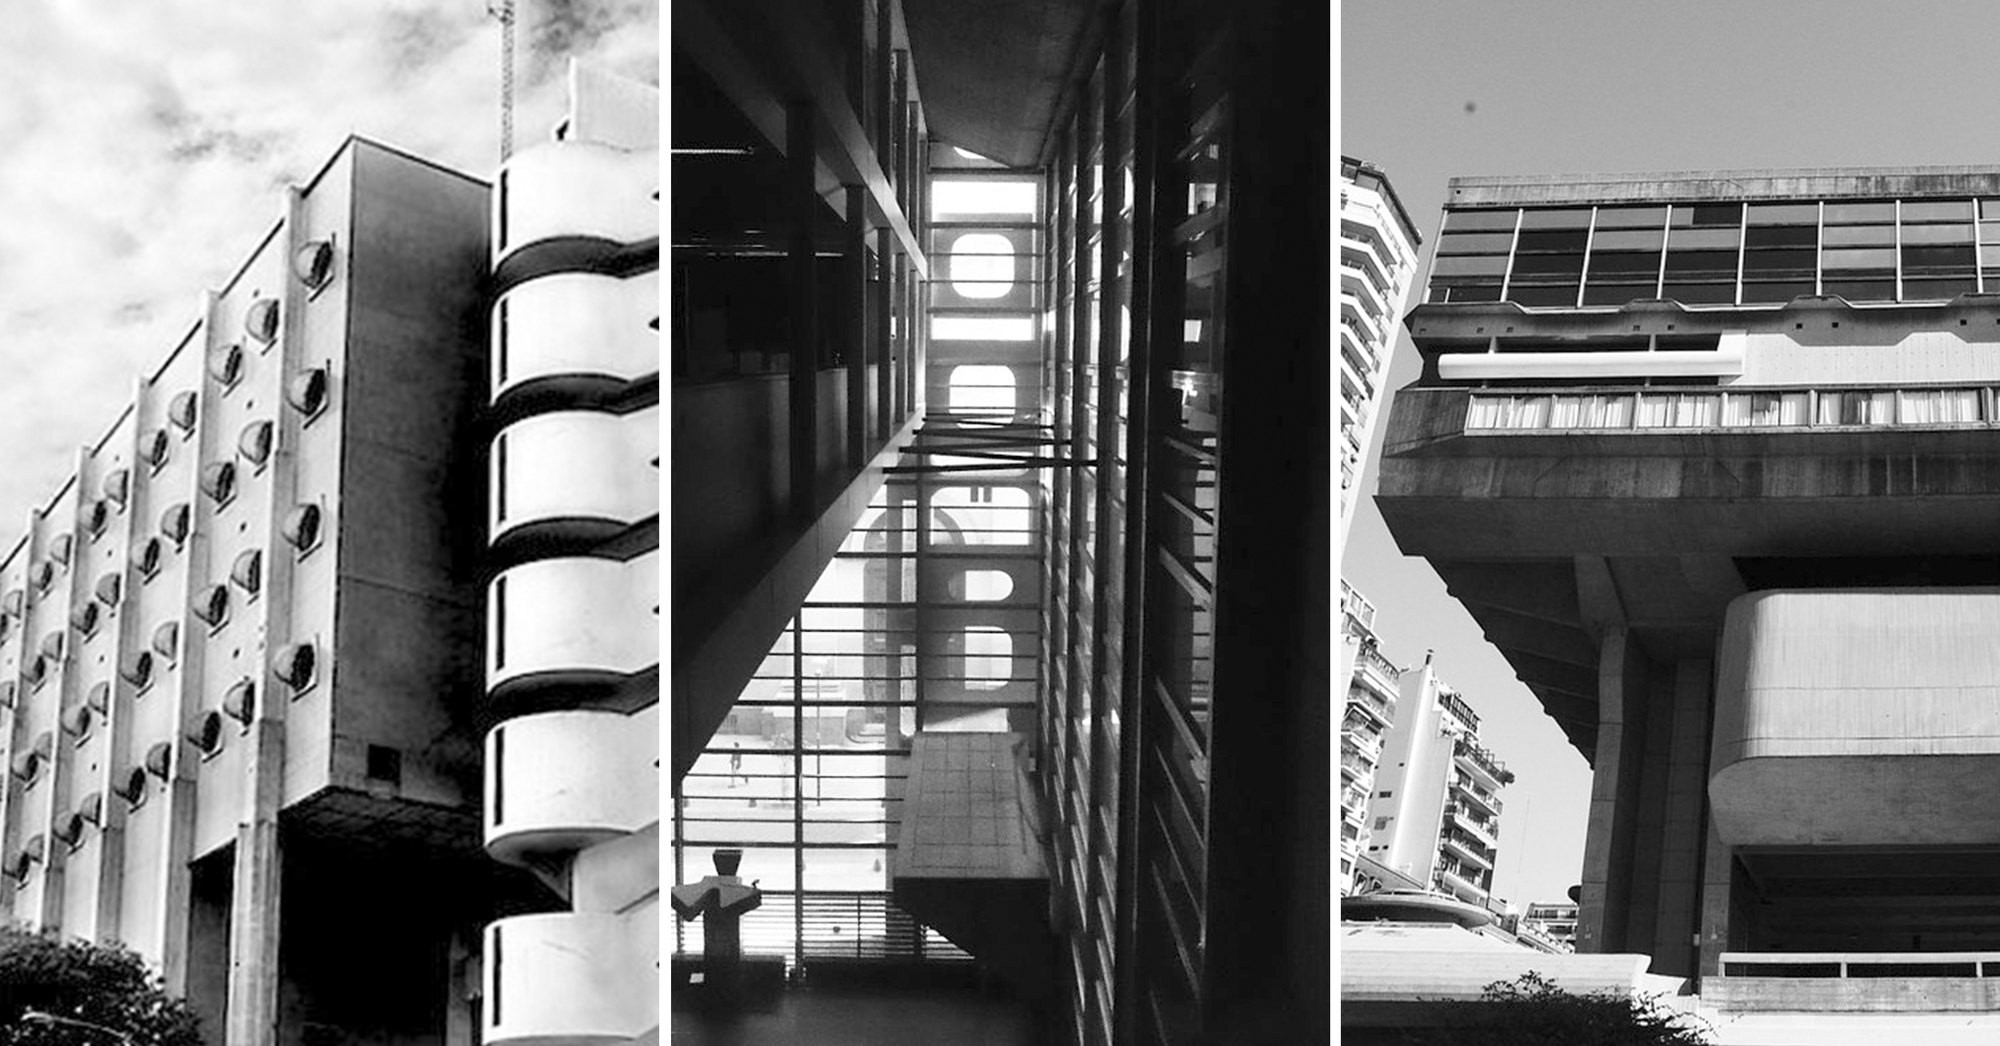 10 Proyectos De Clorindo Testa Que Todo Arquitecto